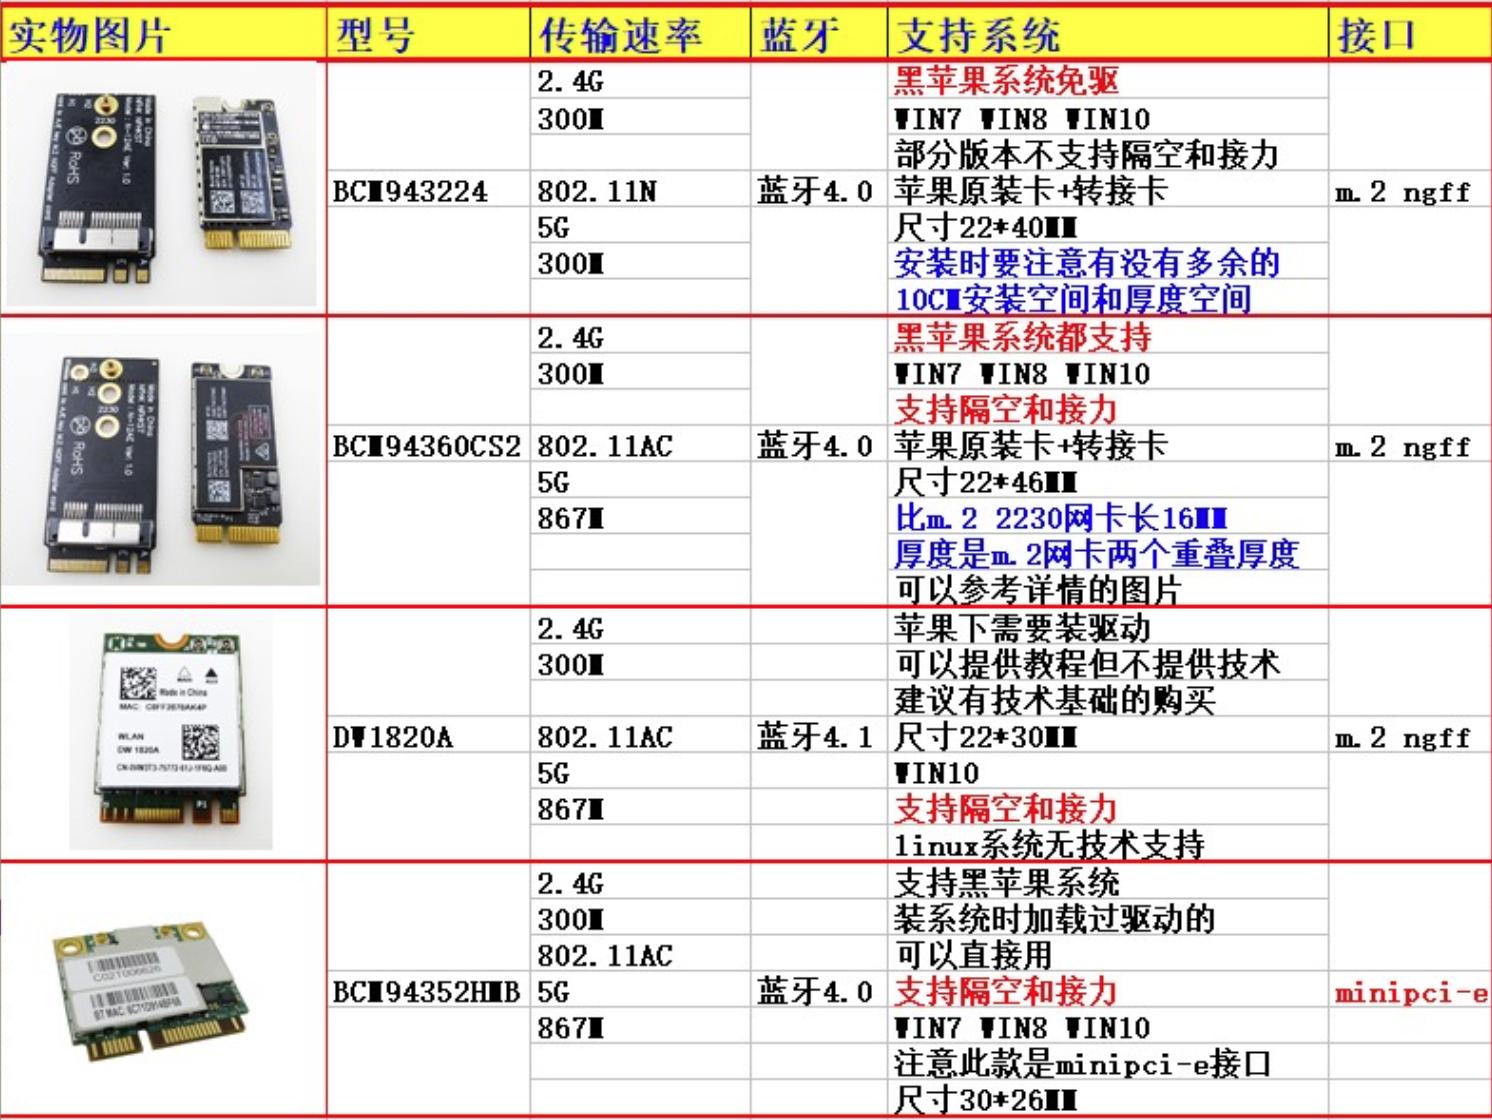 屏幕快照 2019-12-23 23.13.26.png